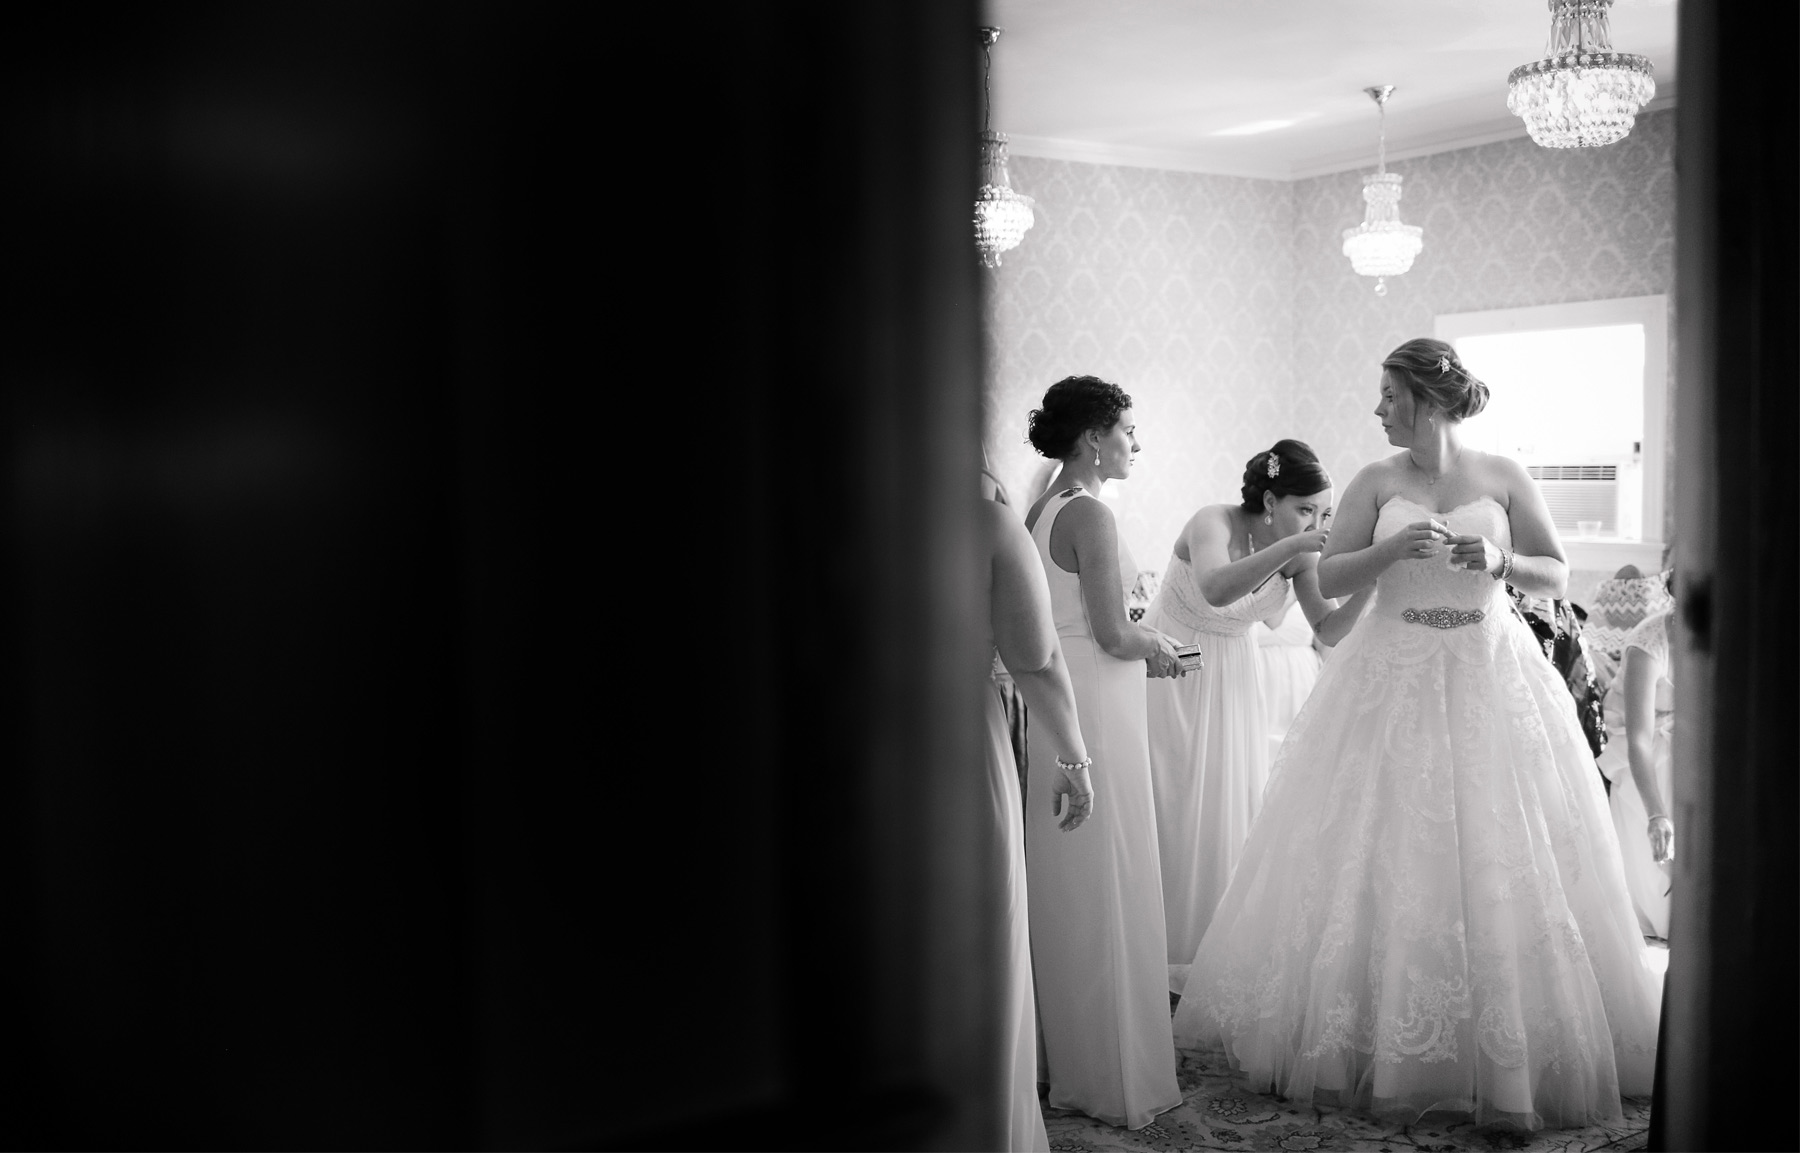 01-Minneapolis-Minnesota-Wedding-Photography-by-Vick-Photography-Semple-Mansion-Wedding-Morning-Bride-Dress-Caitlin-&-Derrick.jpg